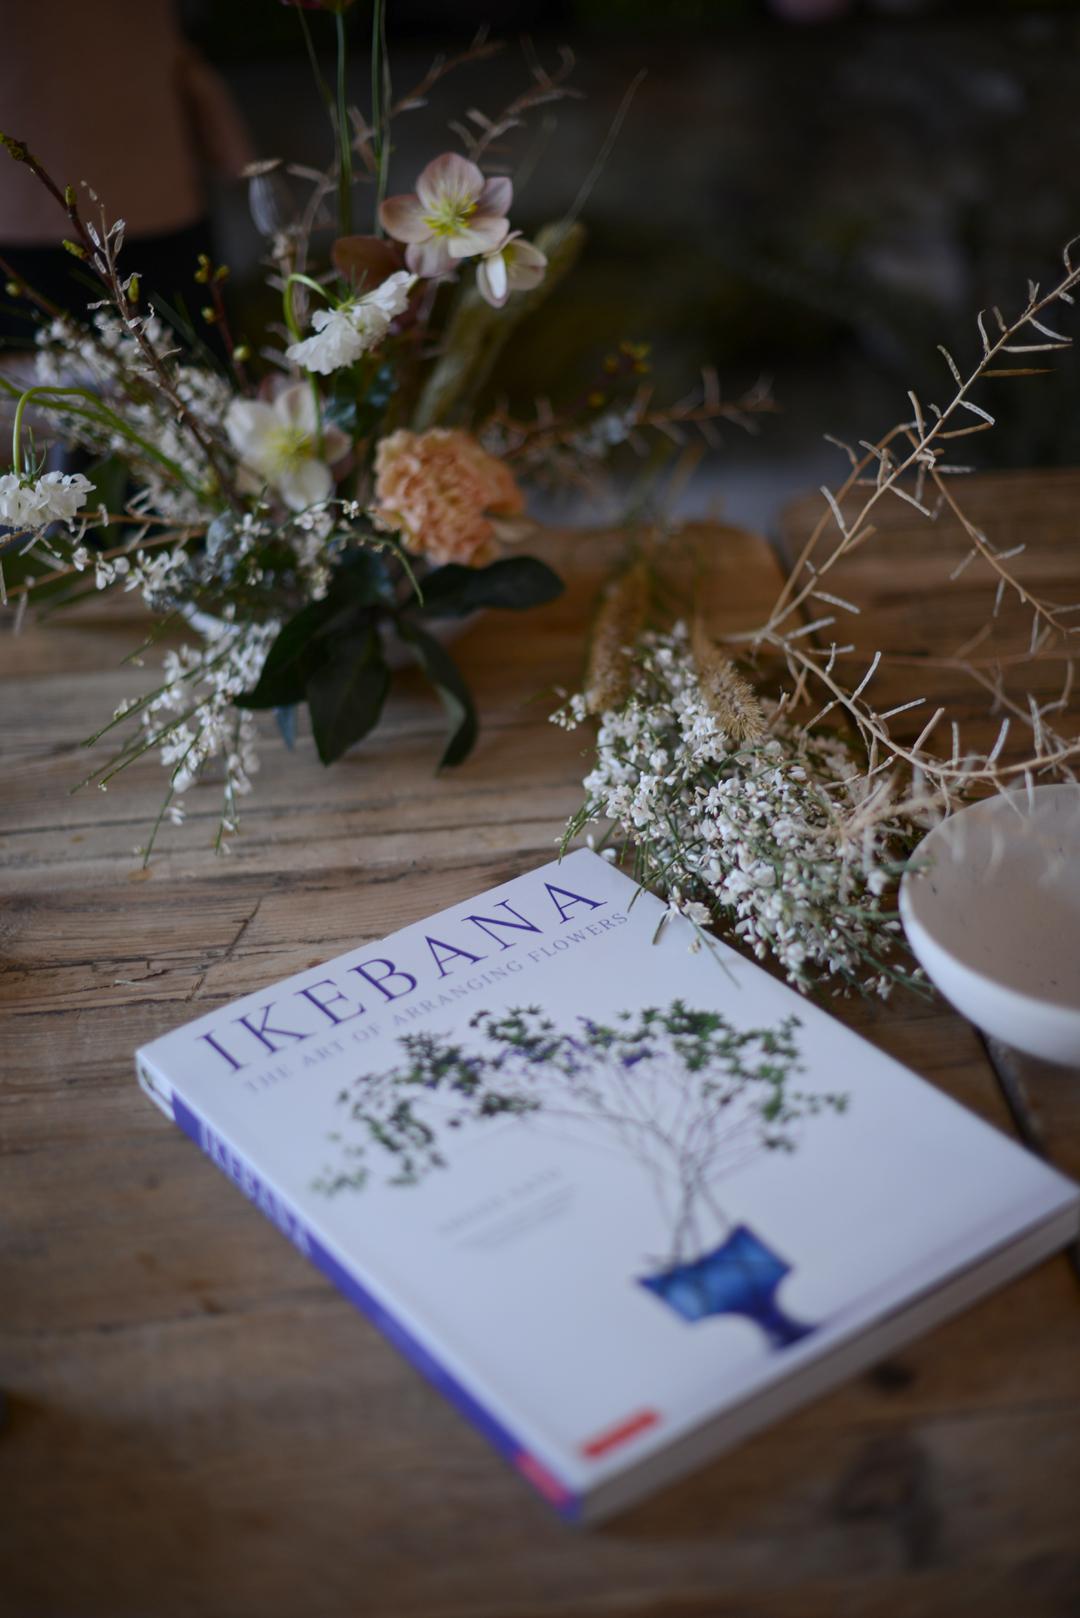 ikebana-workshops-sisterhood-notesfromastylist